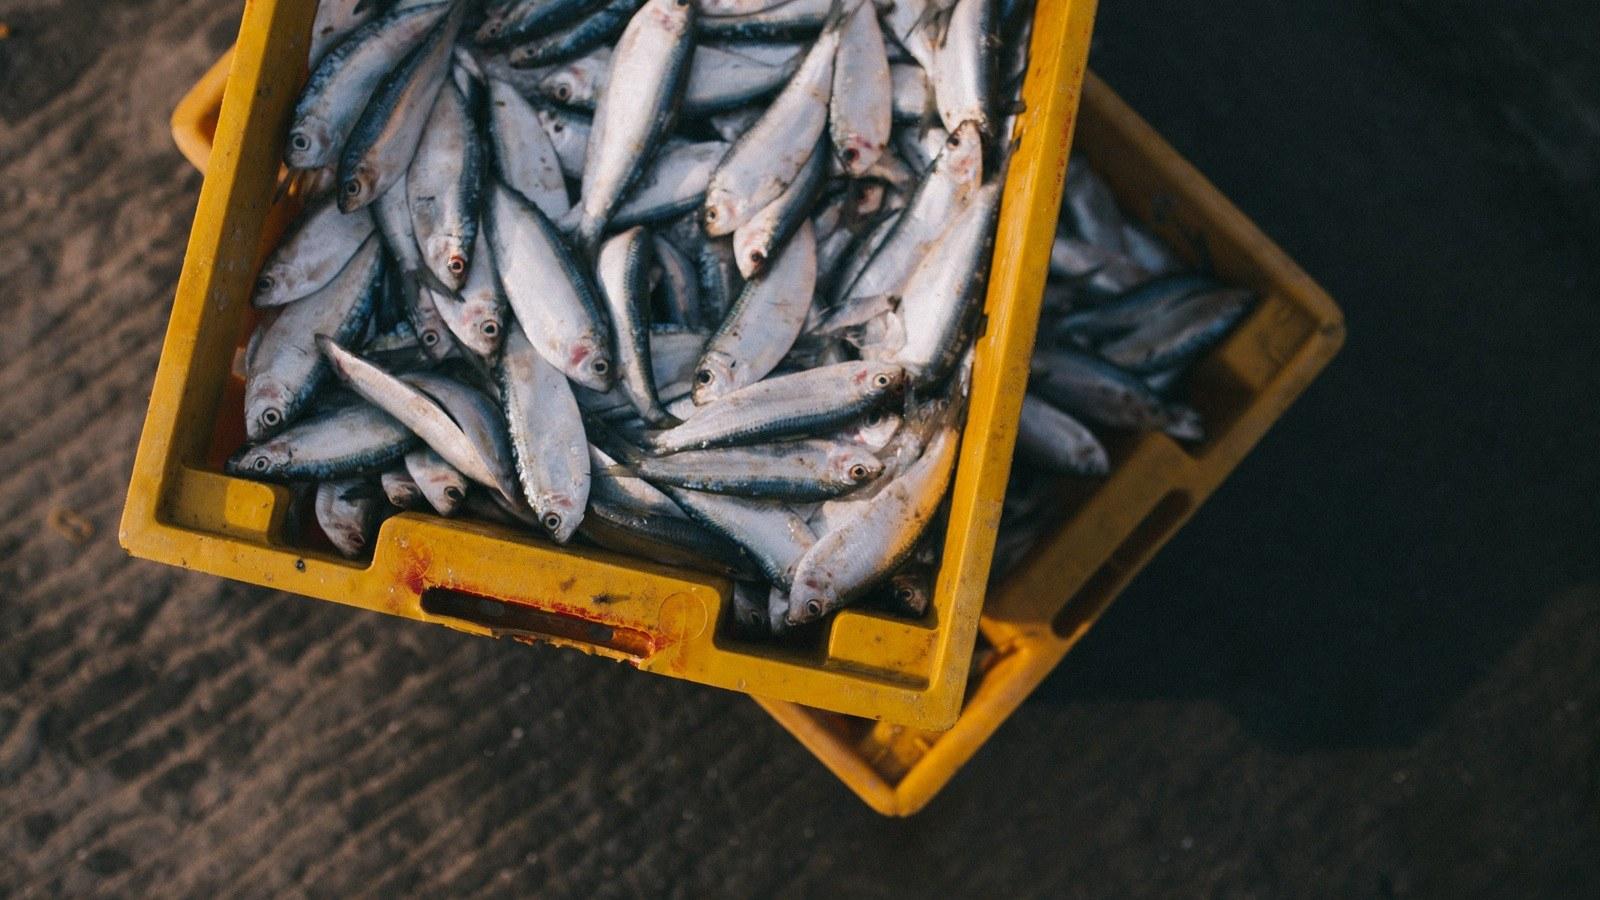 fish-in-crate